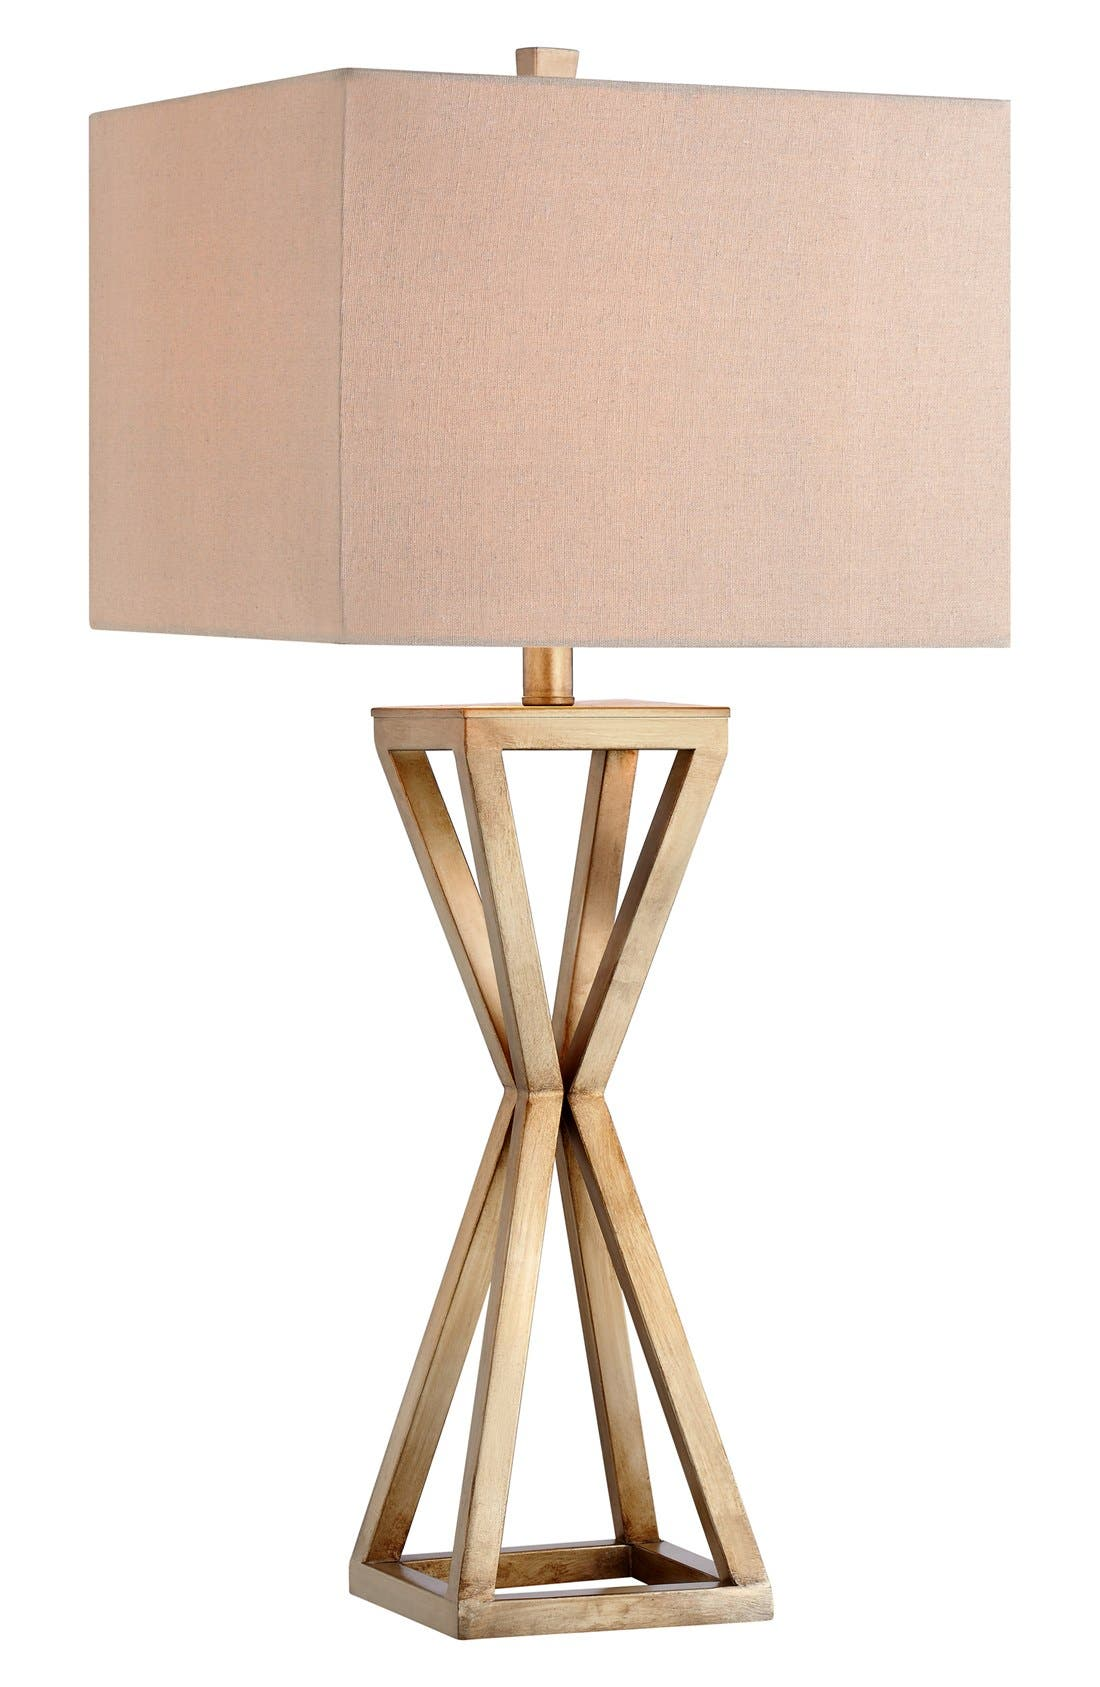 Main Image - JAlexander Lighting Open Caged Metal Table Lamp